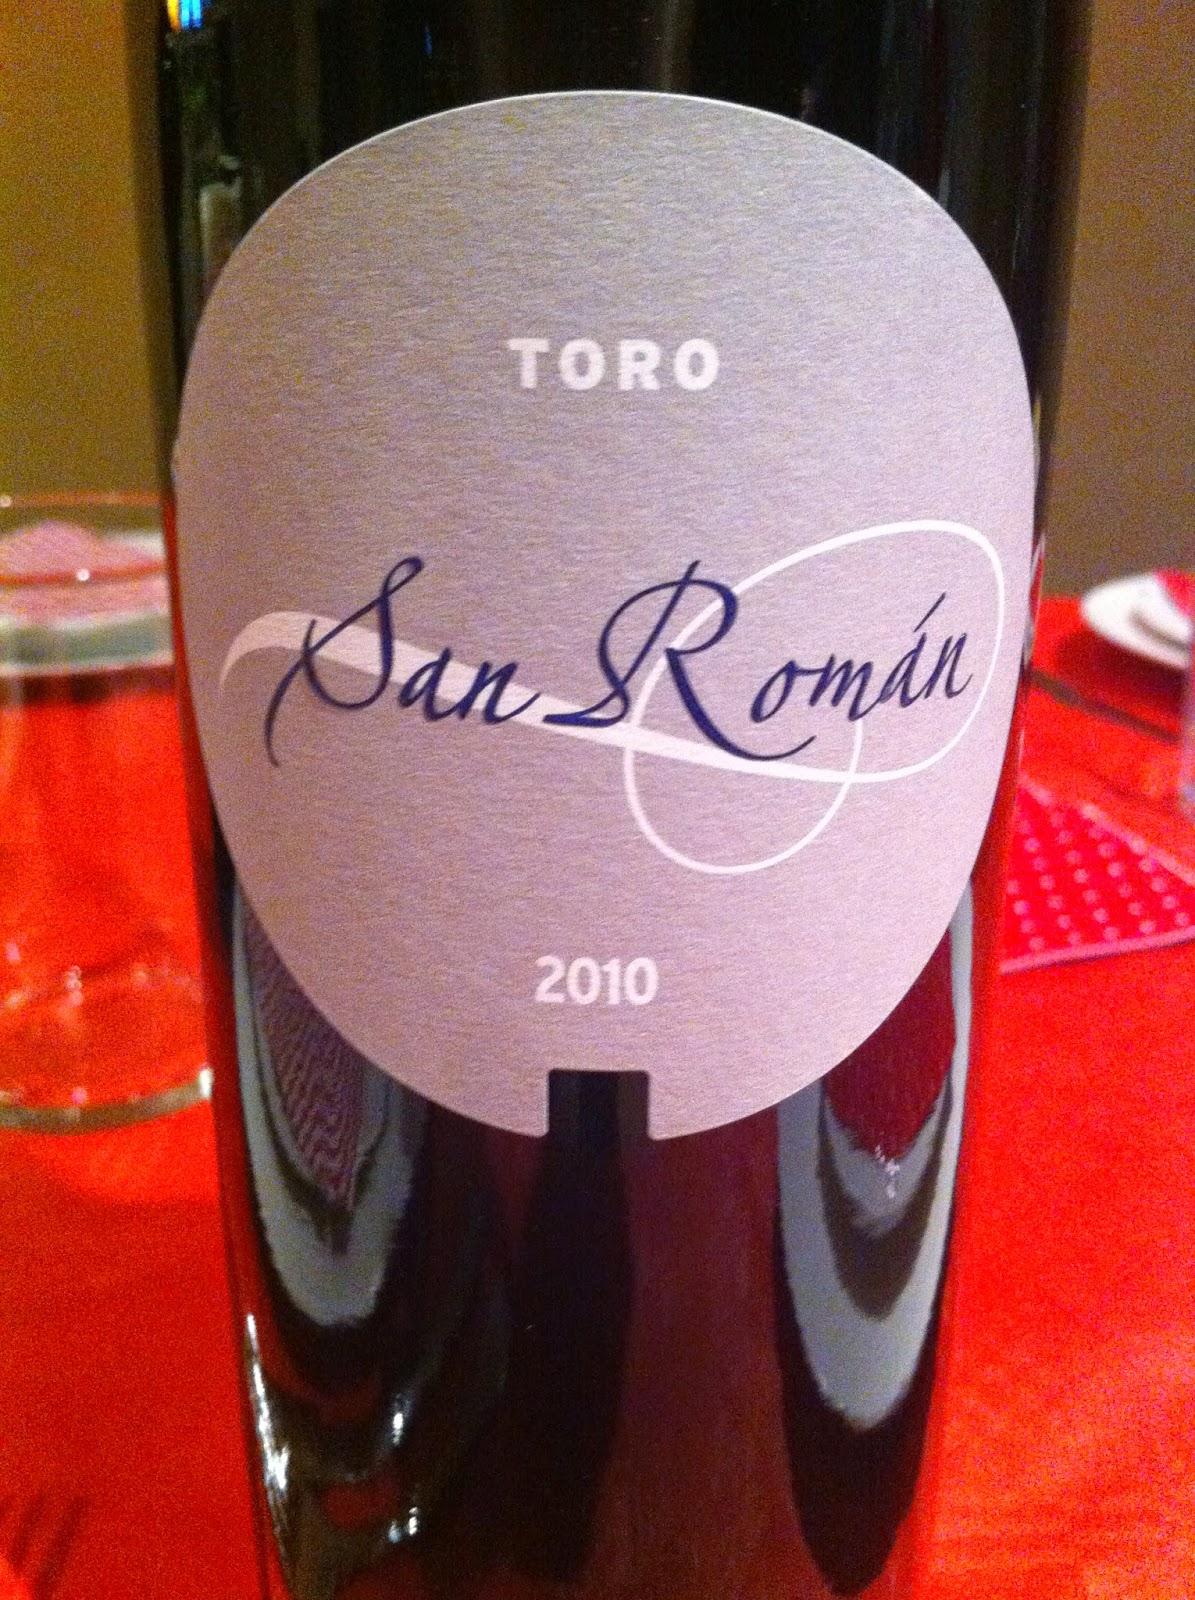 san-román-2010-toro-tinto